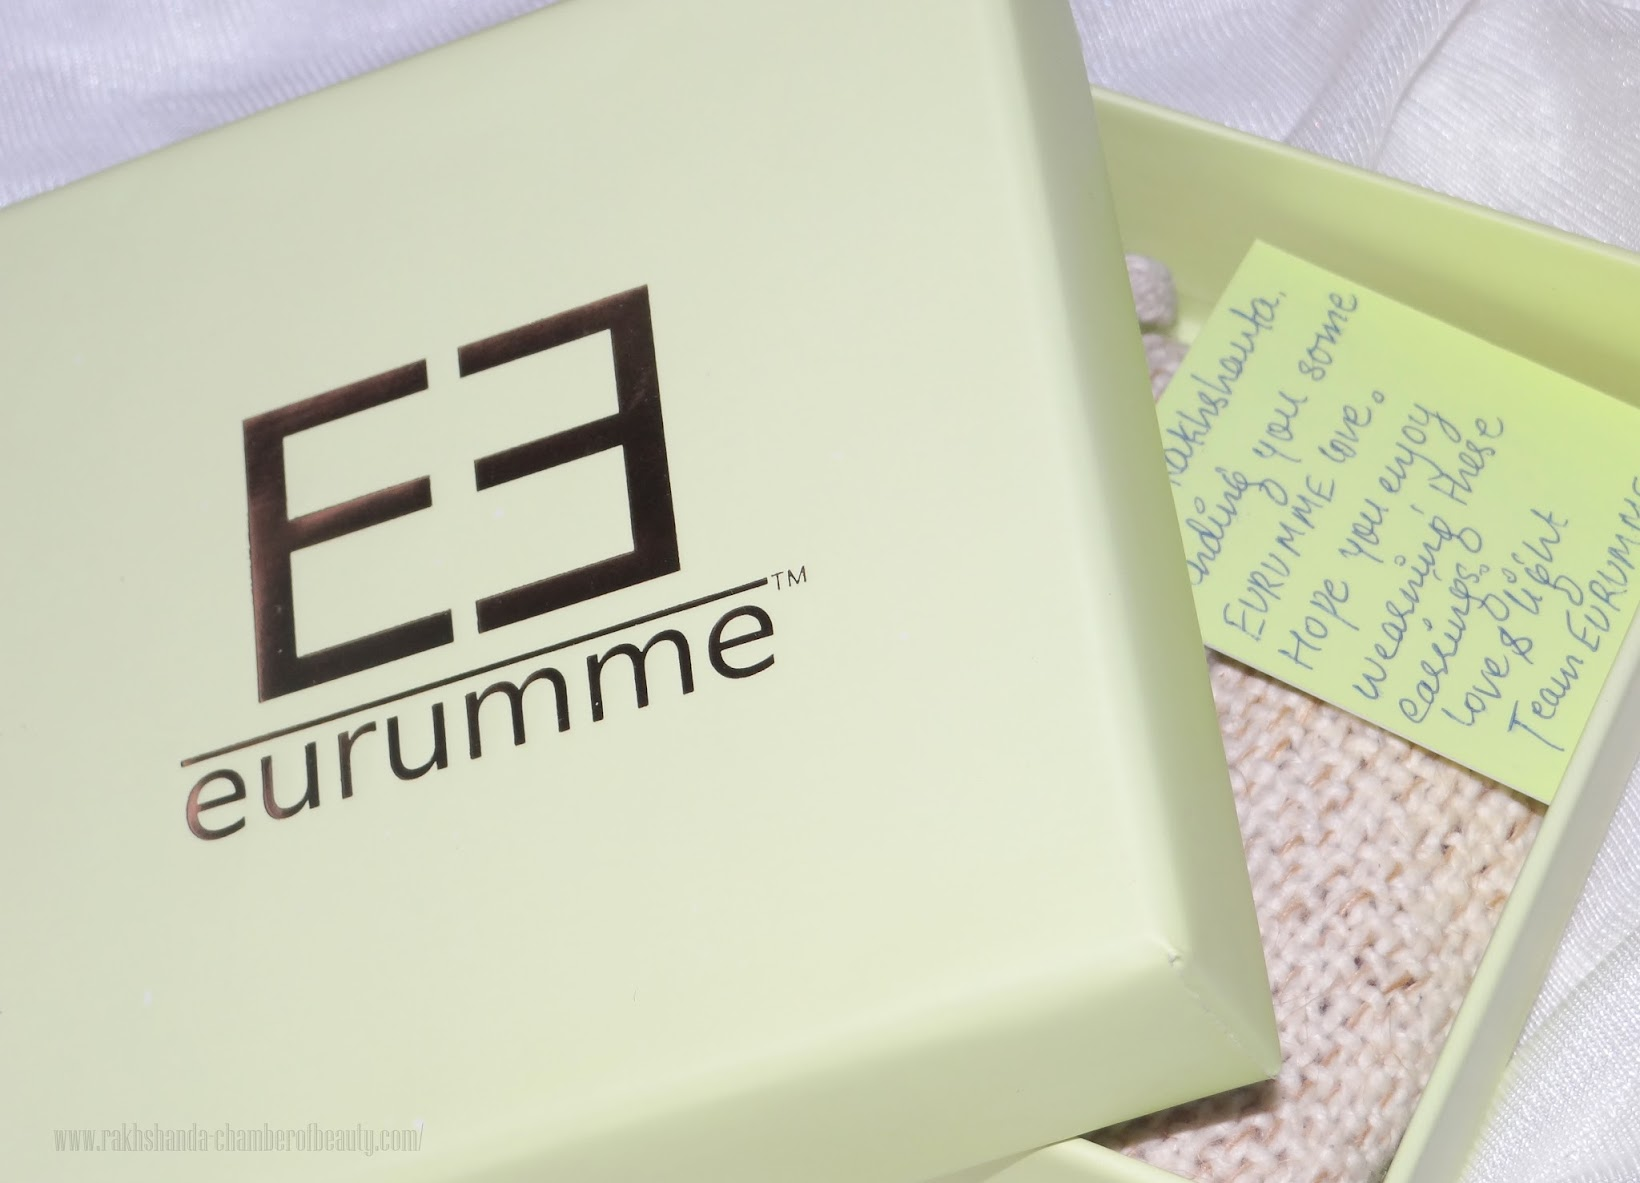 Signature Earrings from Shop Eurumme